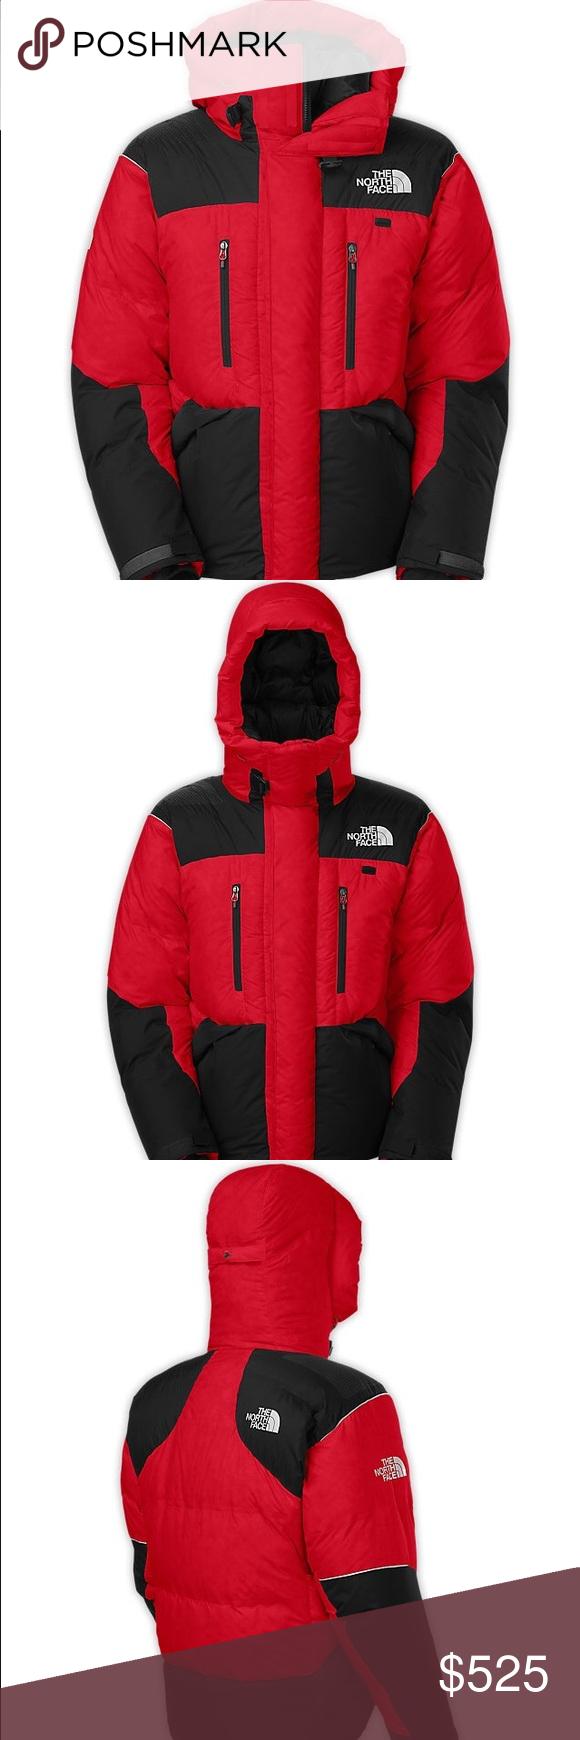 Tnf Men S Himalayan Parka Tnf Red Tnf Black L Parka North Face Jacket North Face Mens [ 1740 x 580 Pixel ]